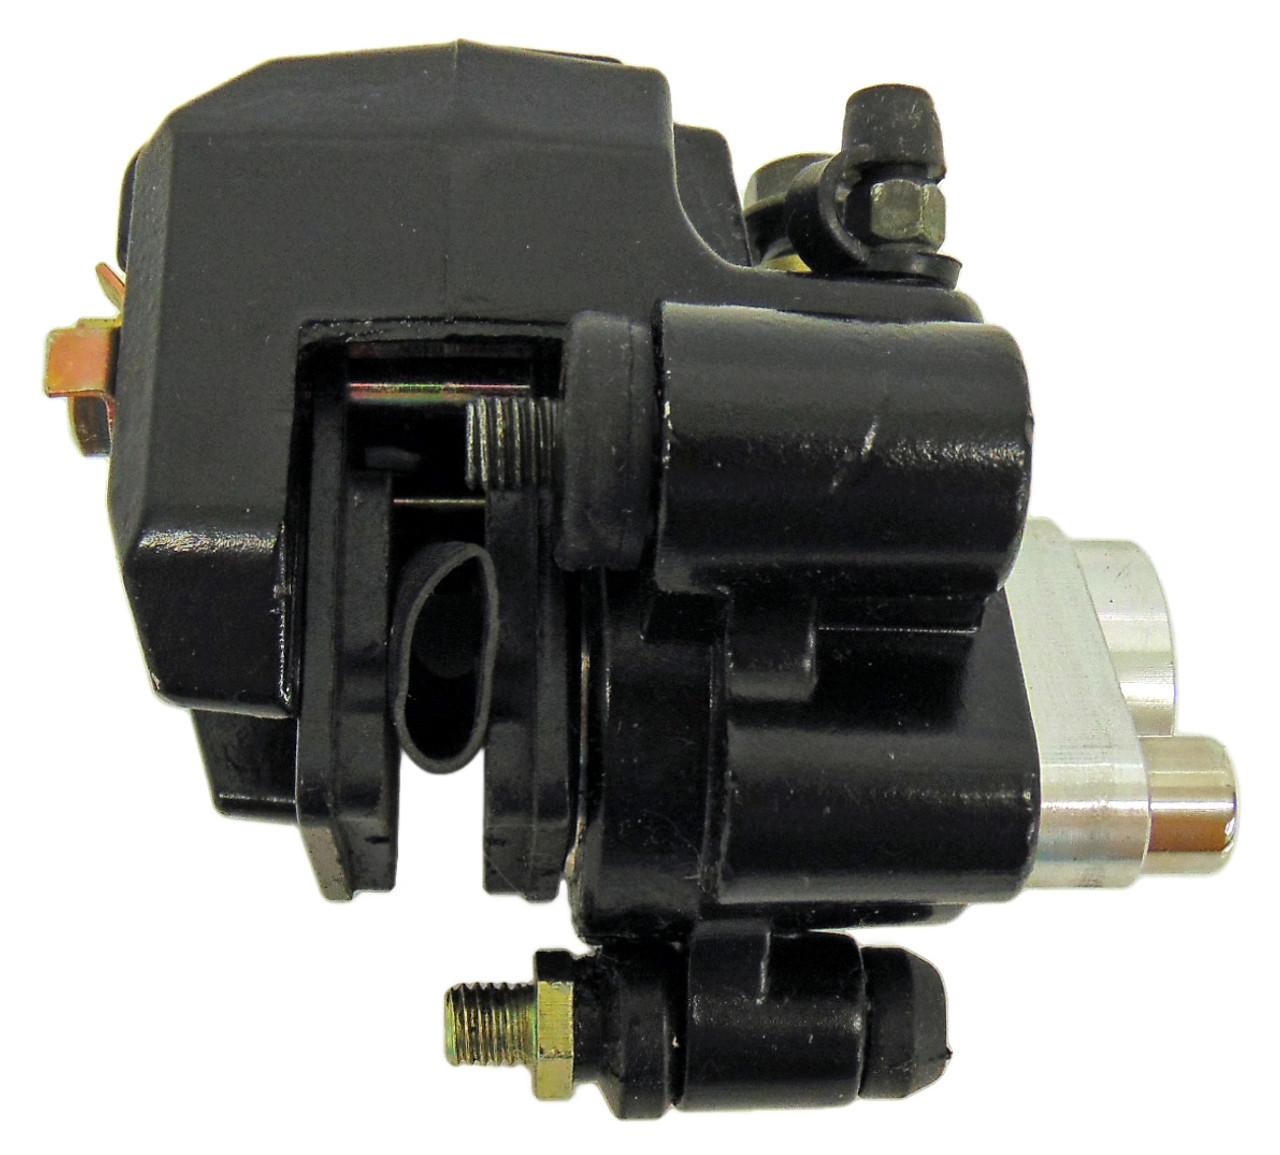 Rear Brake Caliper W// Pads for HONDA ATC350X  ATC 350X 1985 1986